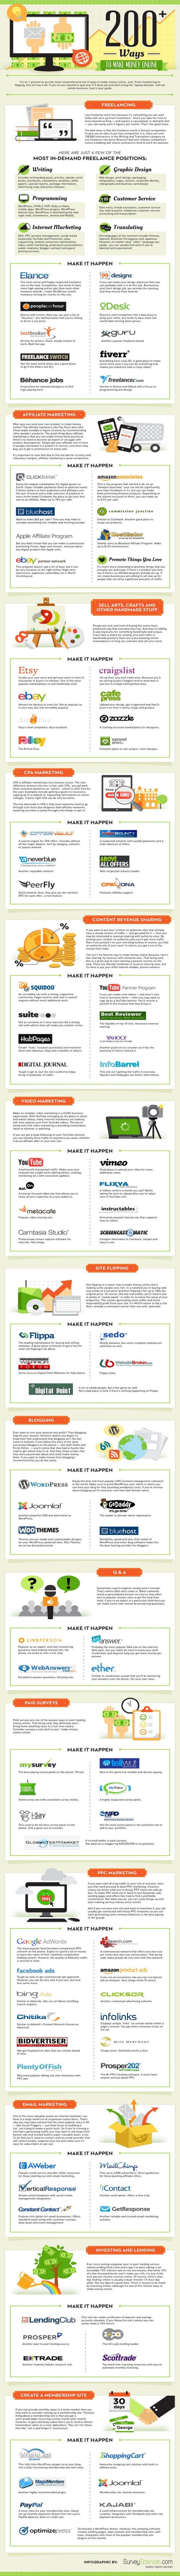 200 Ways to Make Money Online | Infographic